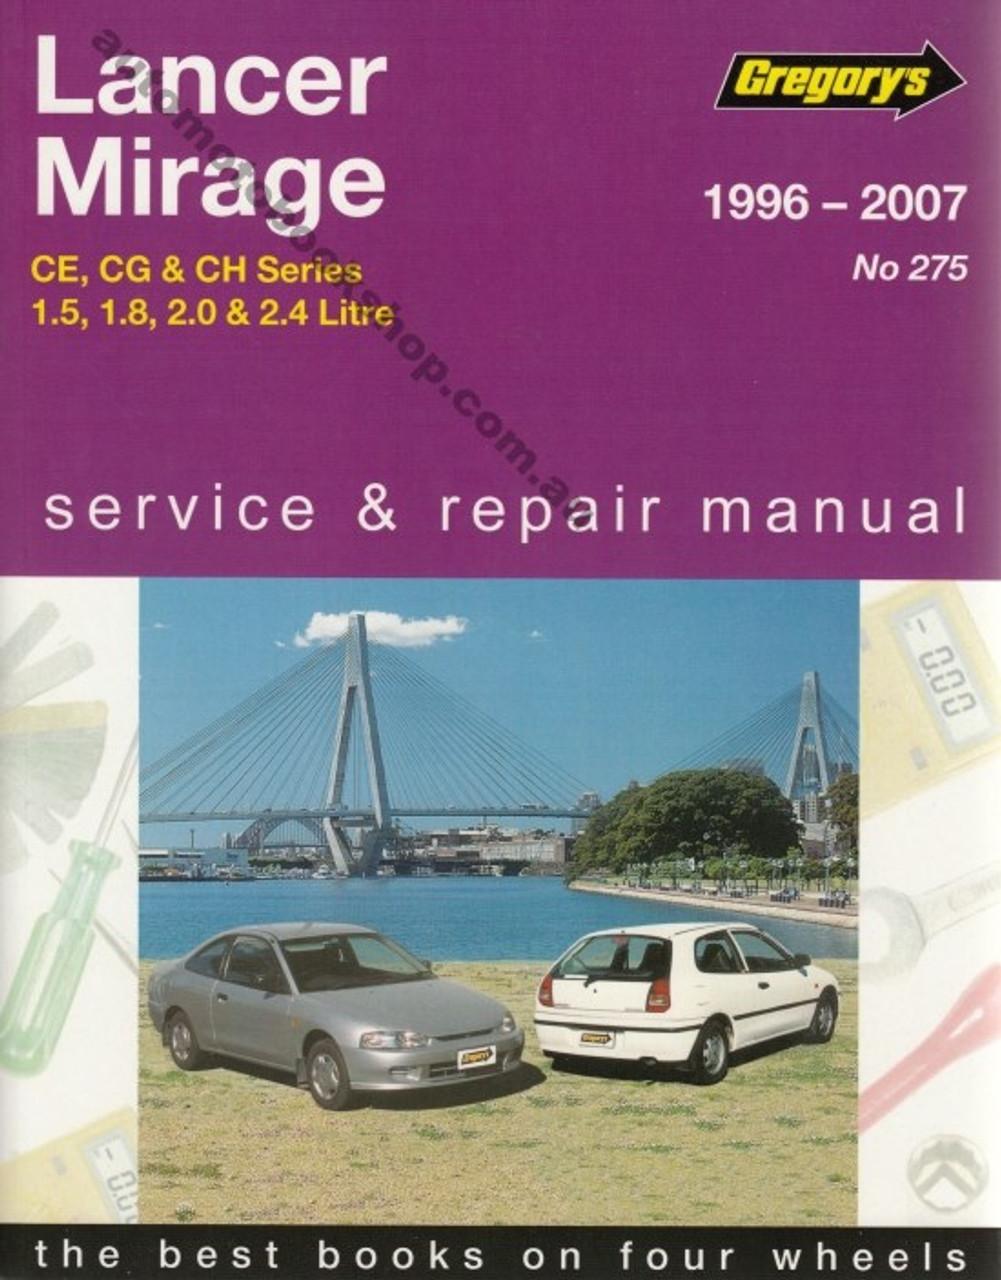 sony hcd dz830 dav dz830 service manual and repair guide